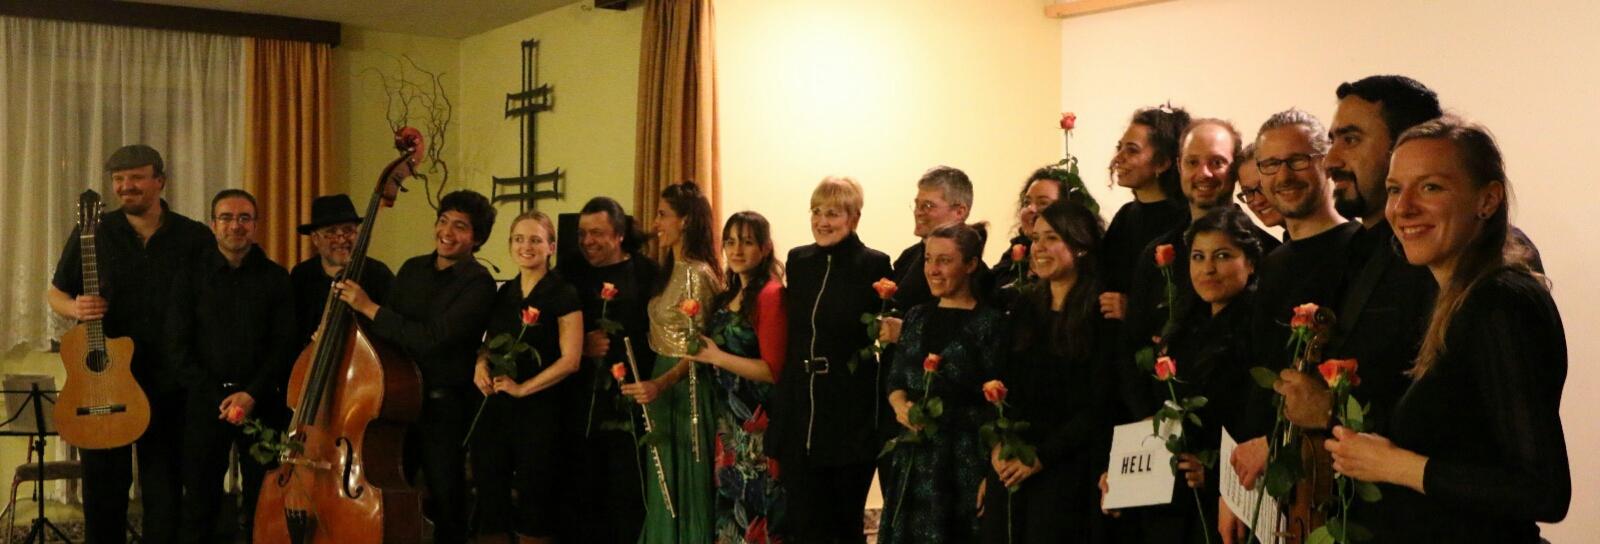 20190322_Tango_Premiere hell in Ostritz_Damaris Ehninger (13).jpg